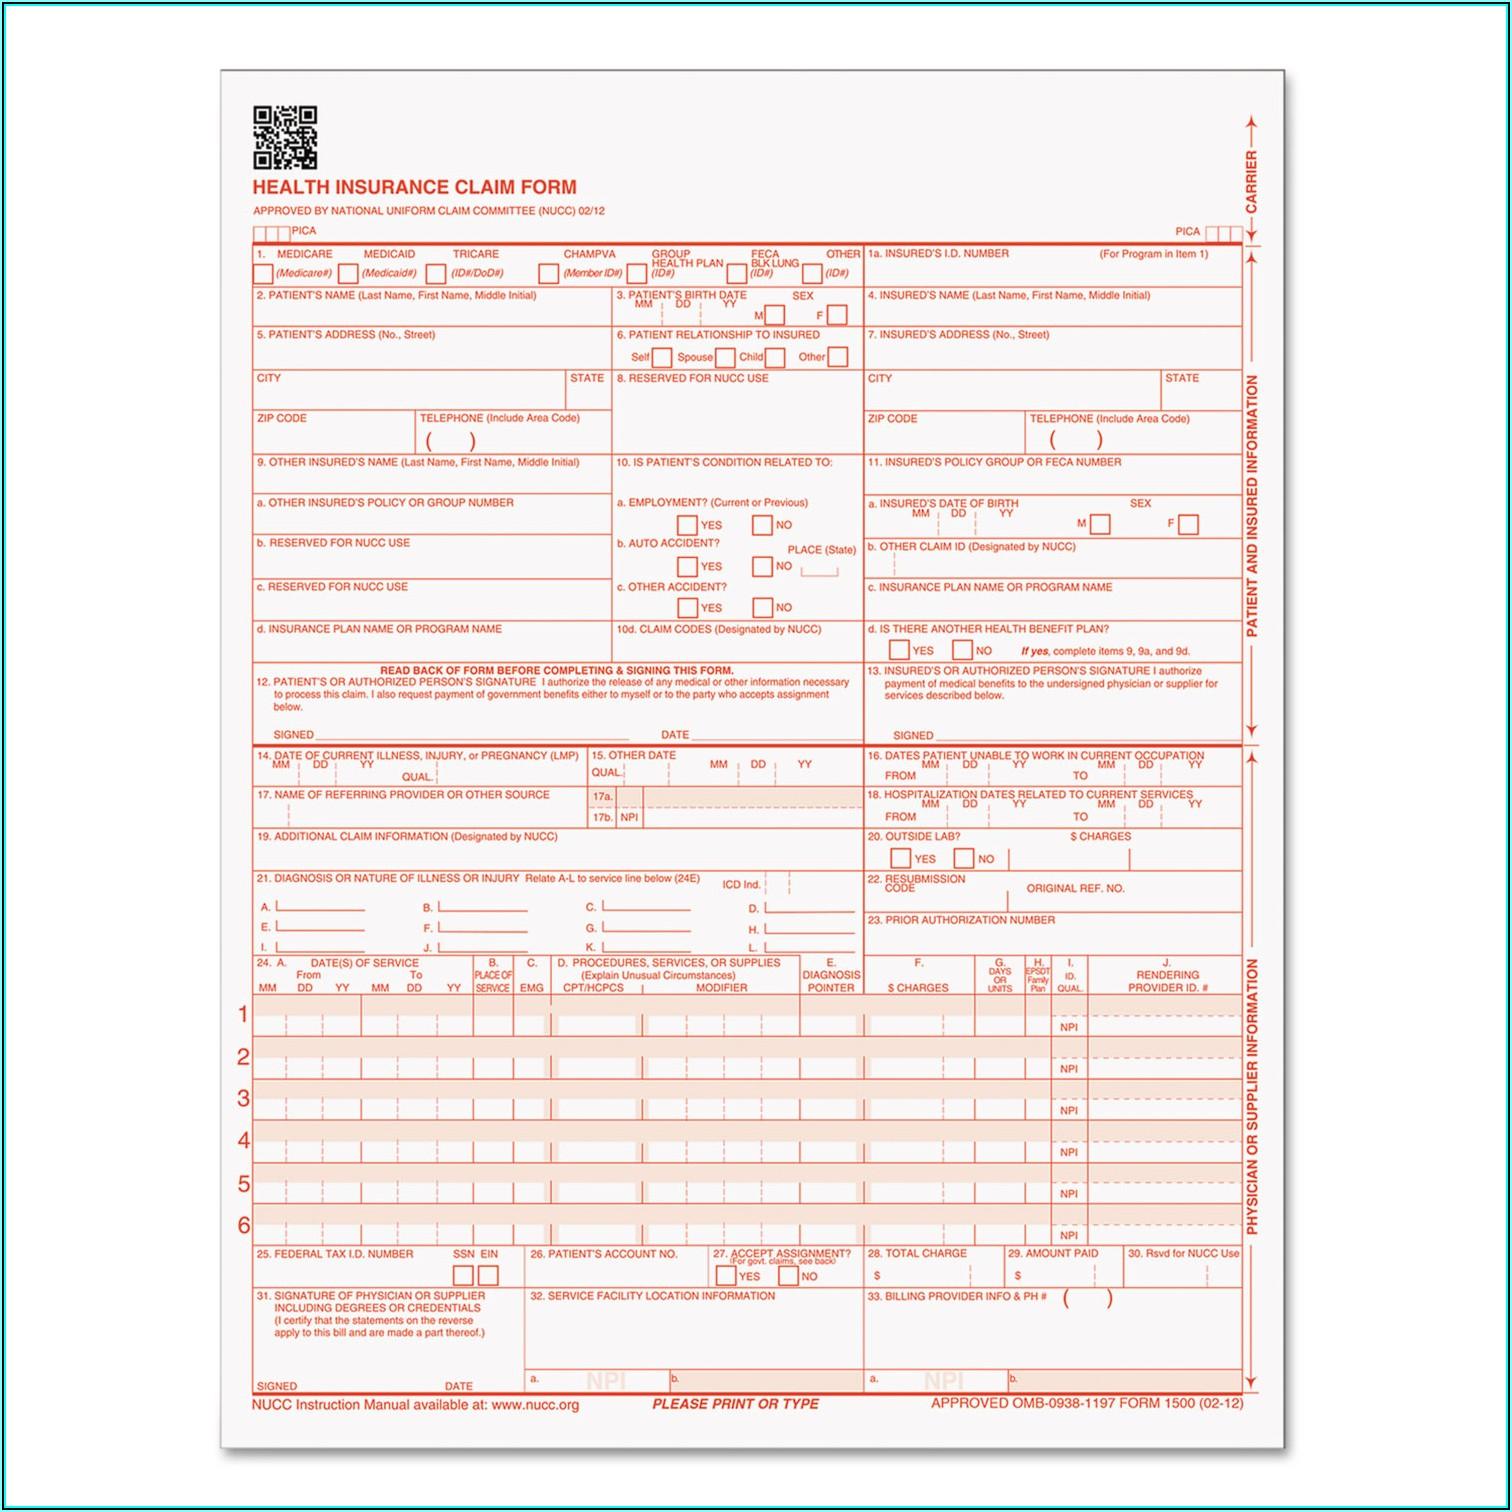 Cms 1500 Medicare Attachment Form